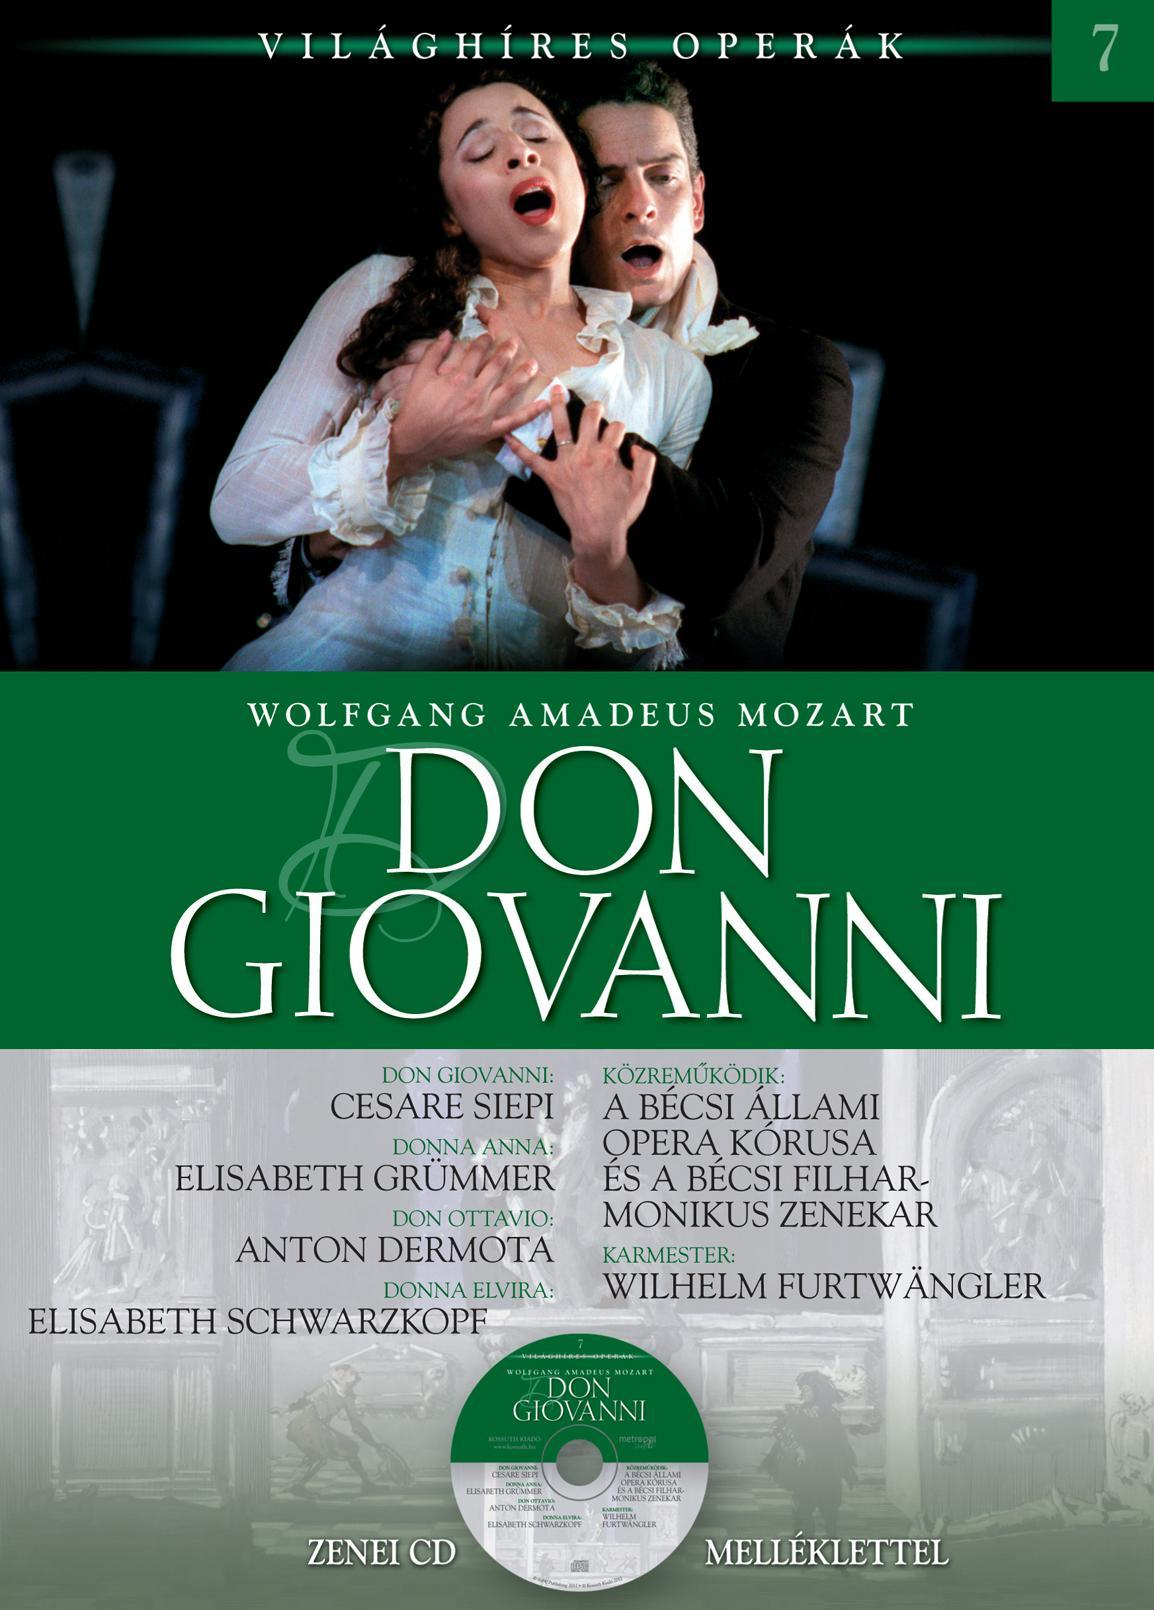 DON GIOVANNI - VILÁGHÍRES OPERÁK 7. - CD-VEL